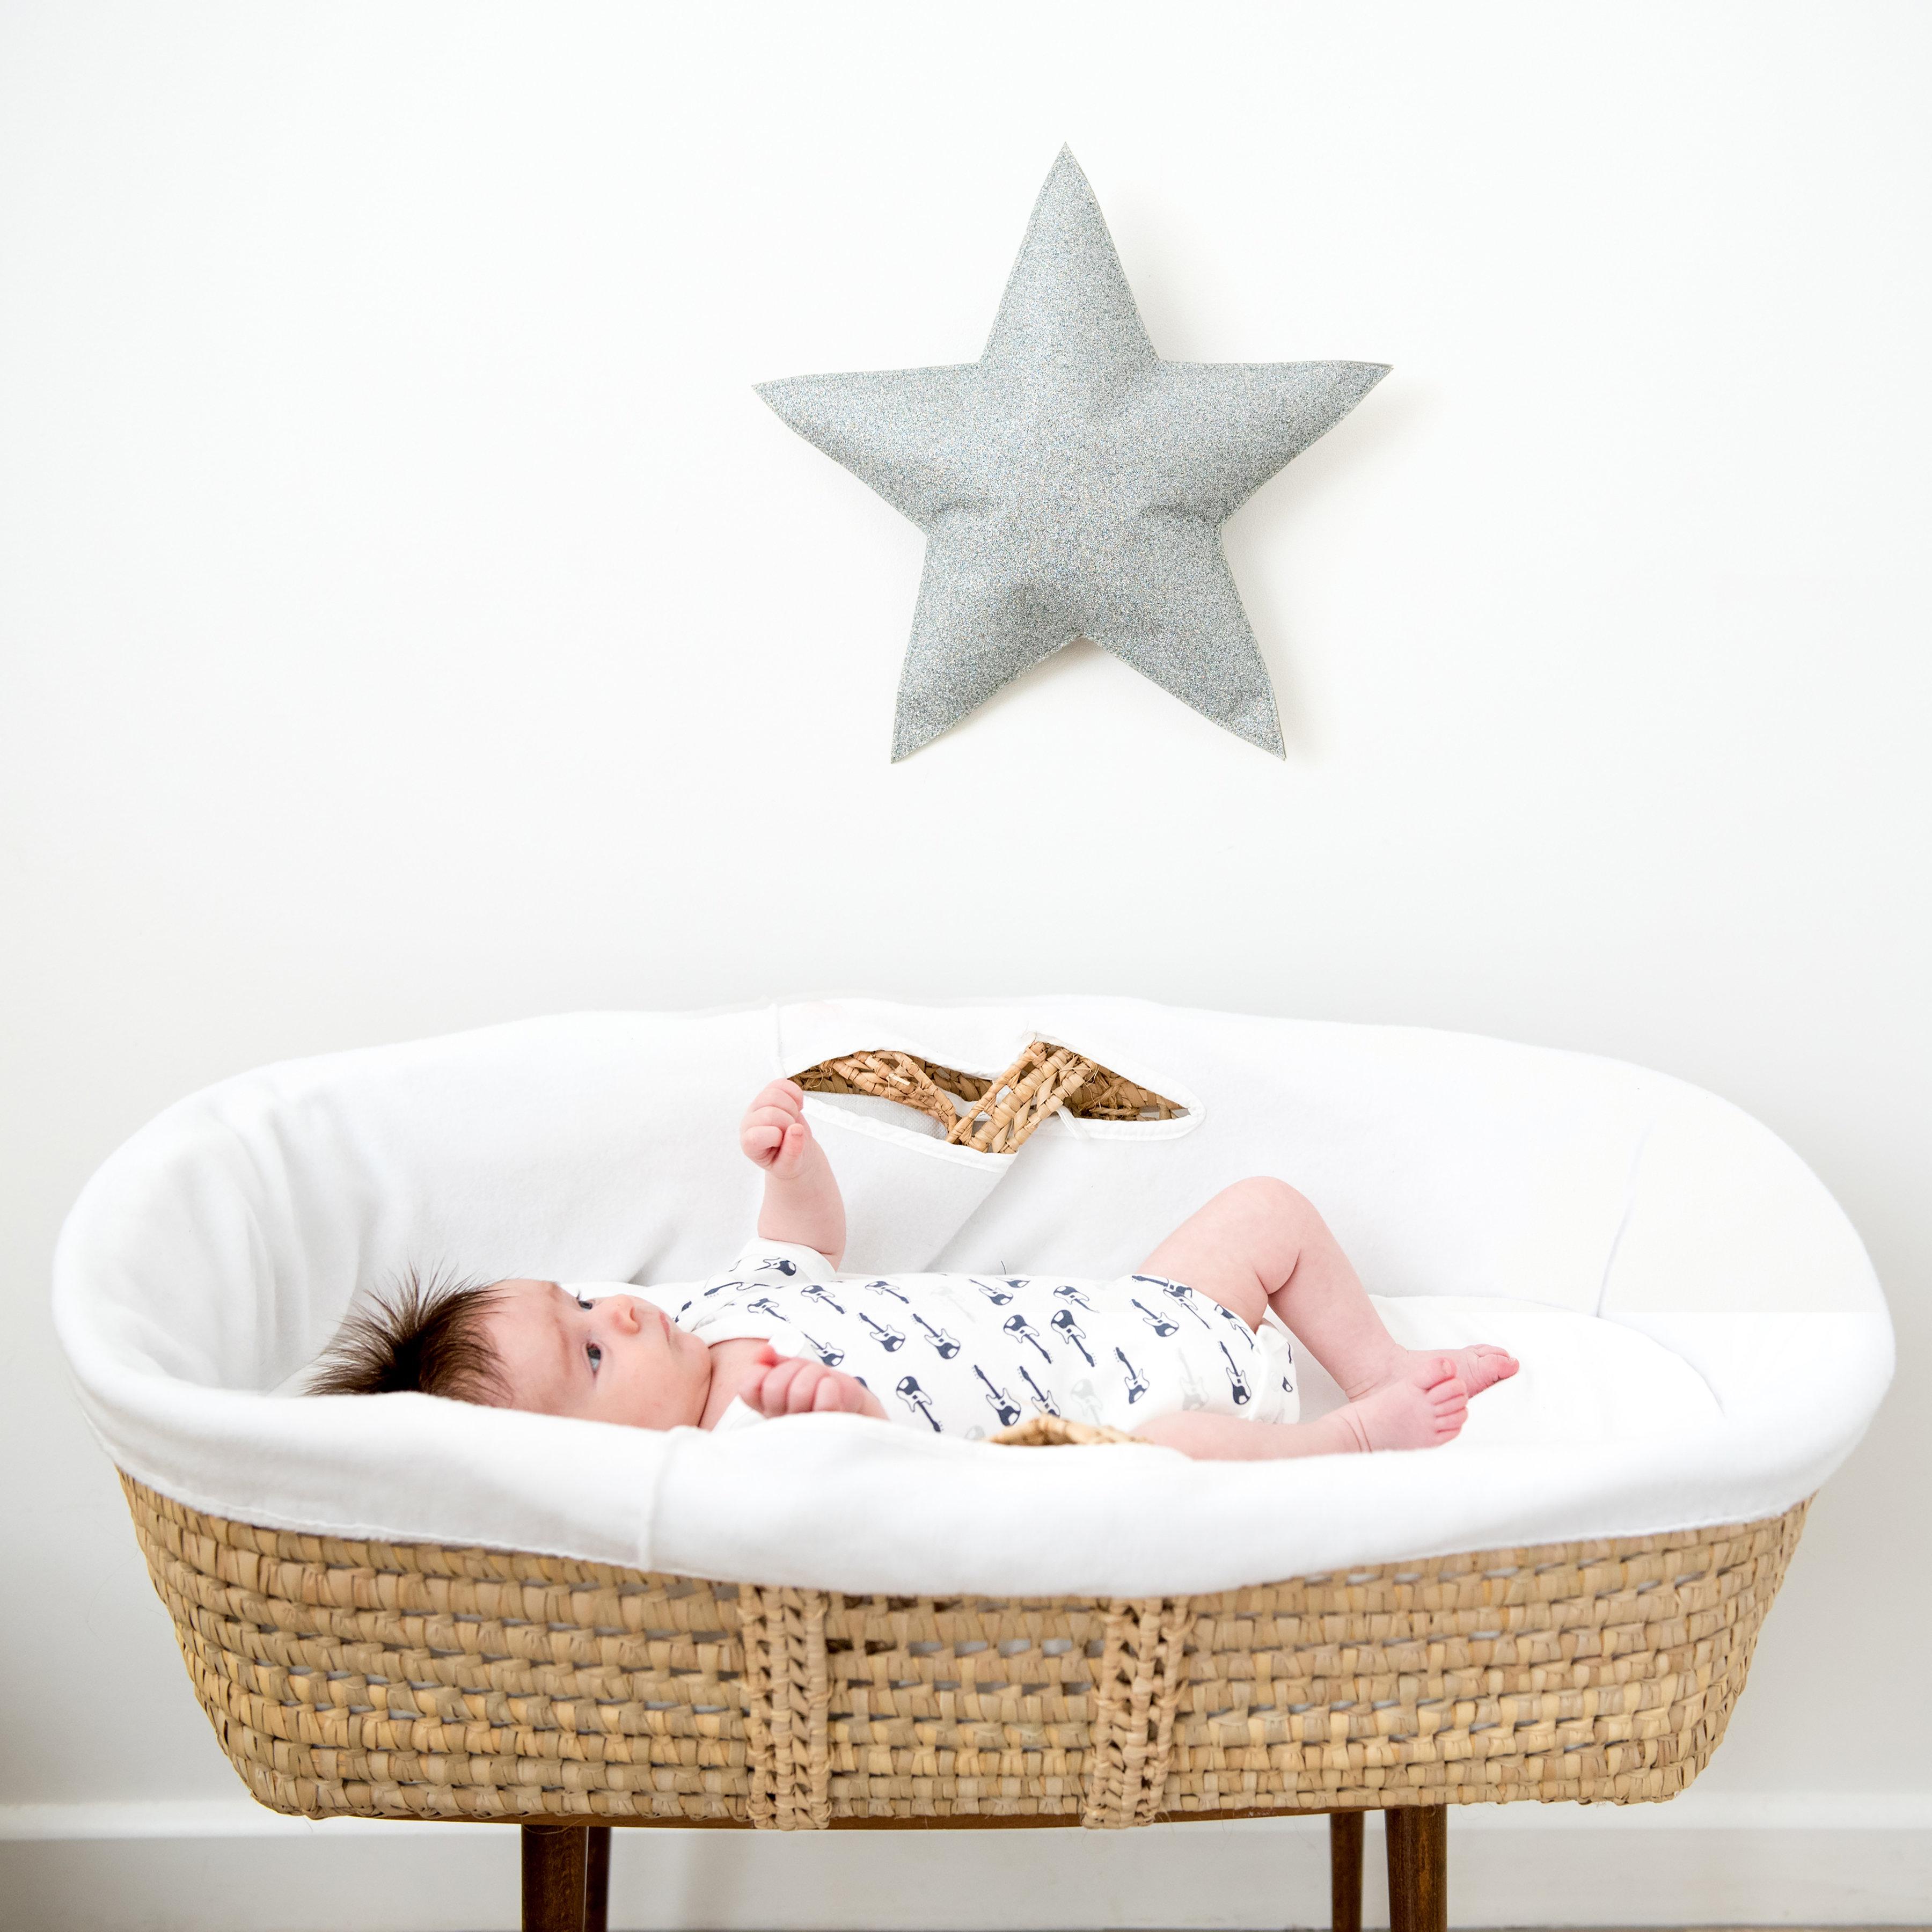 Silver Glitter Star Fabric Wall Decor Shop Indie